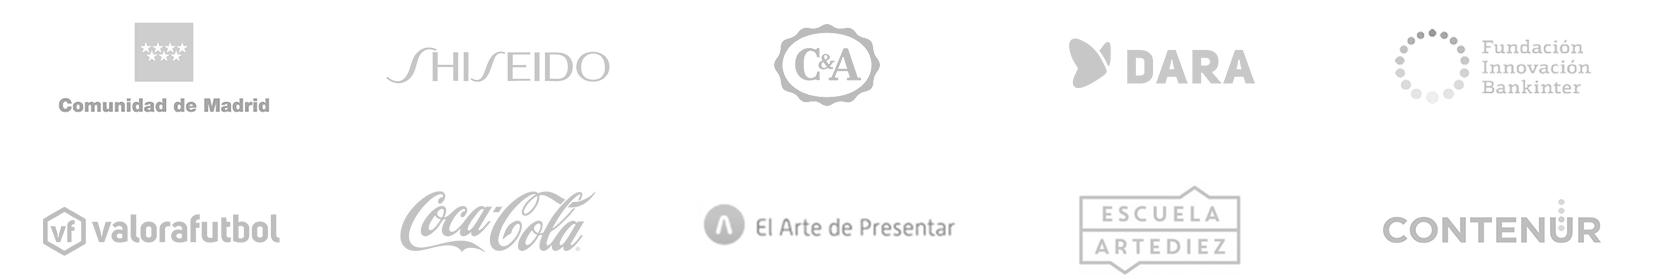 logos_1656PX